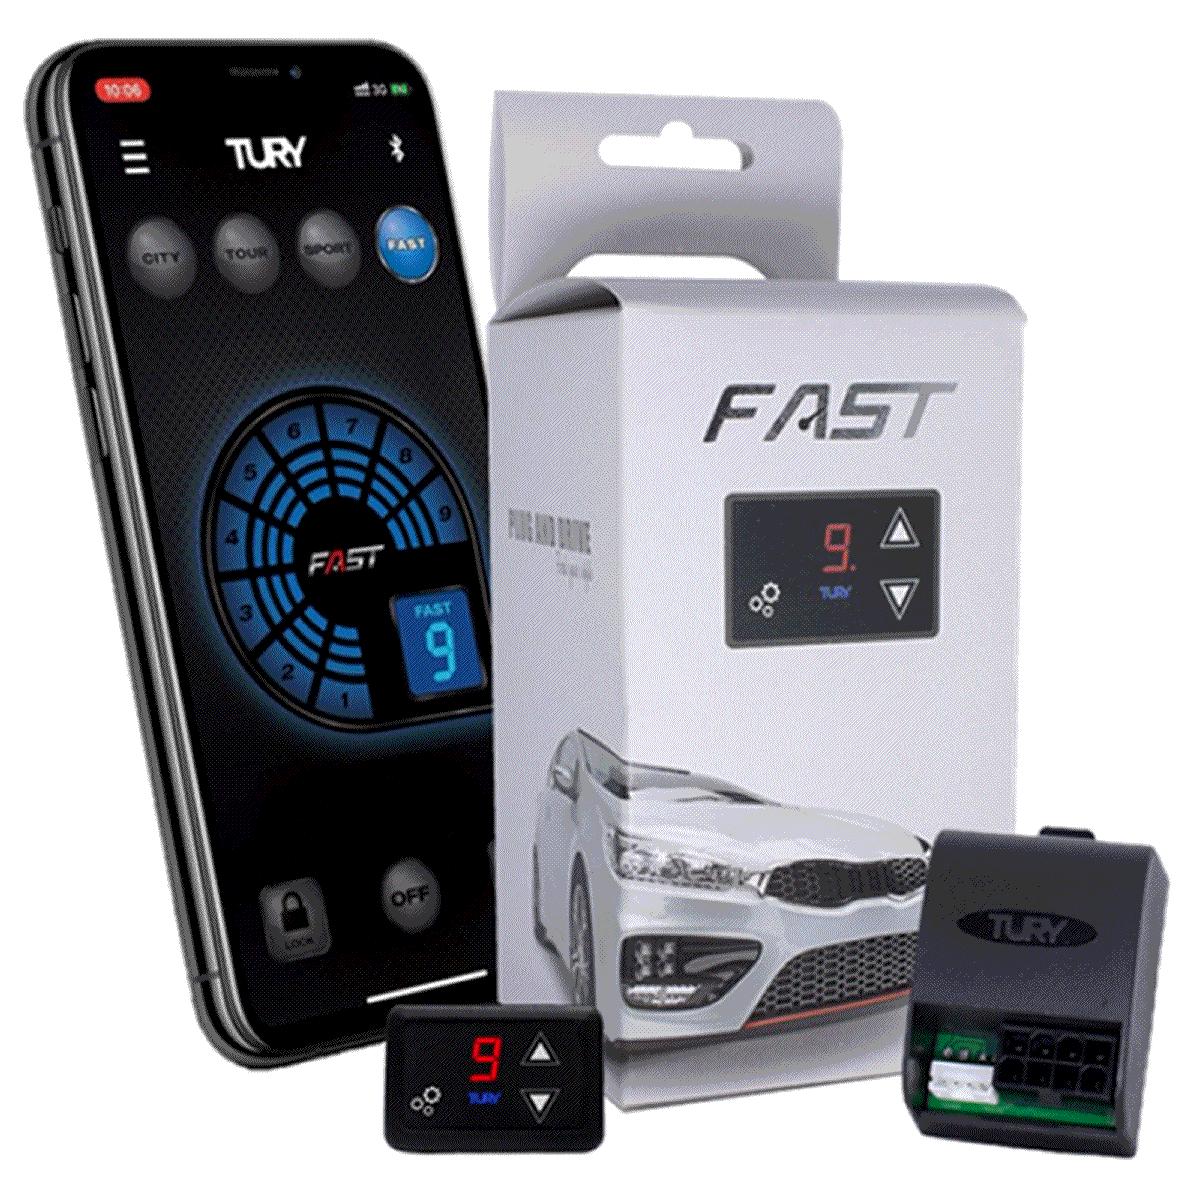 Fast 2.0 O Módulo Acelerador Fiat Jac Kia Nissan ... Plug & Play